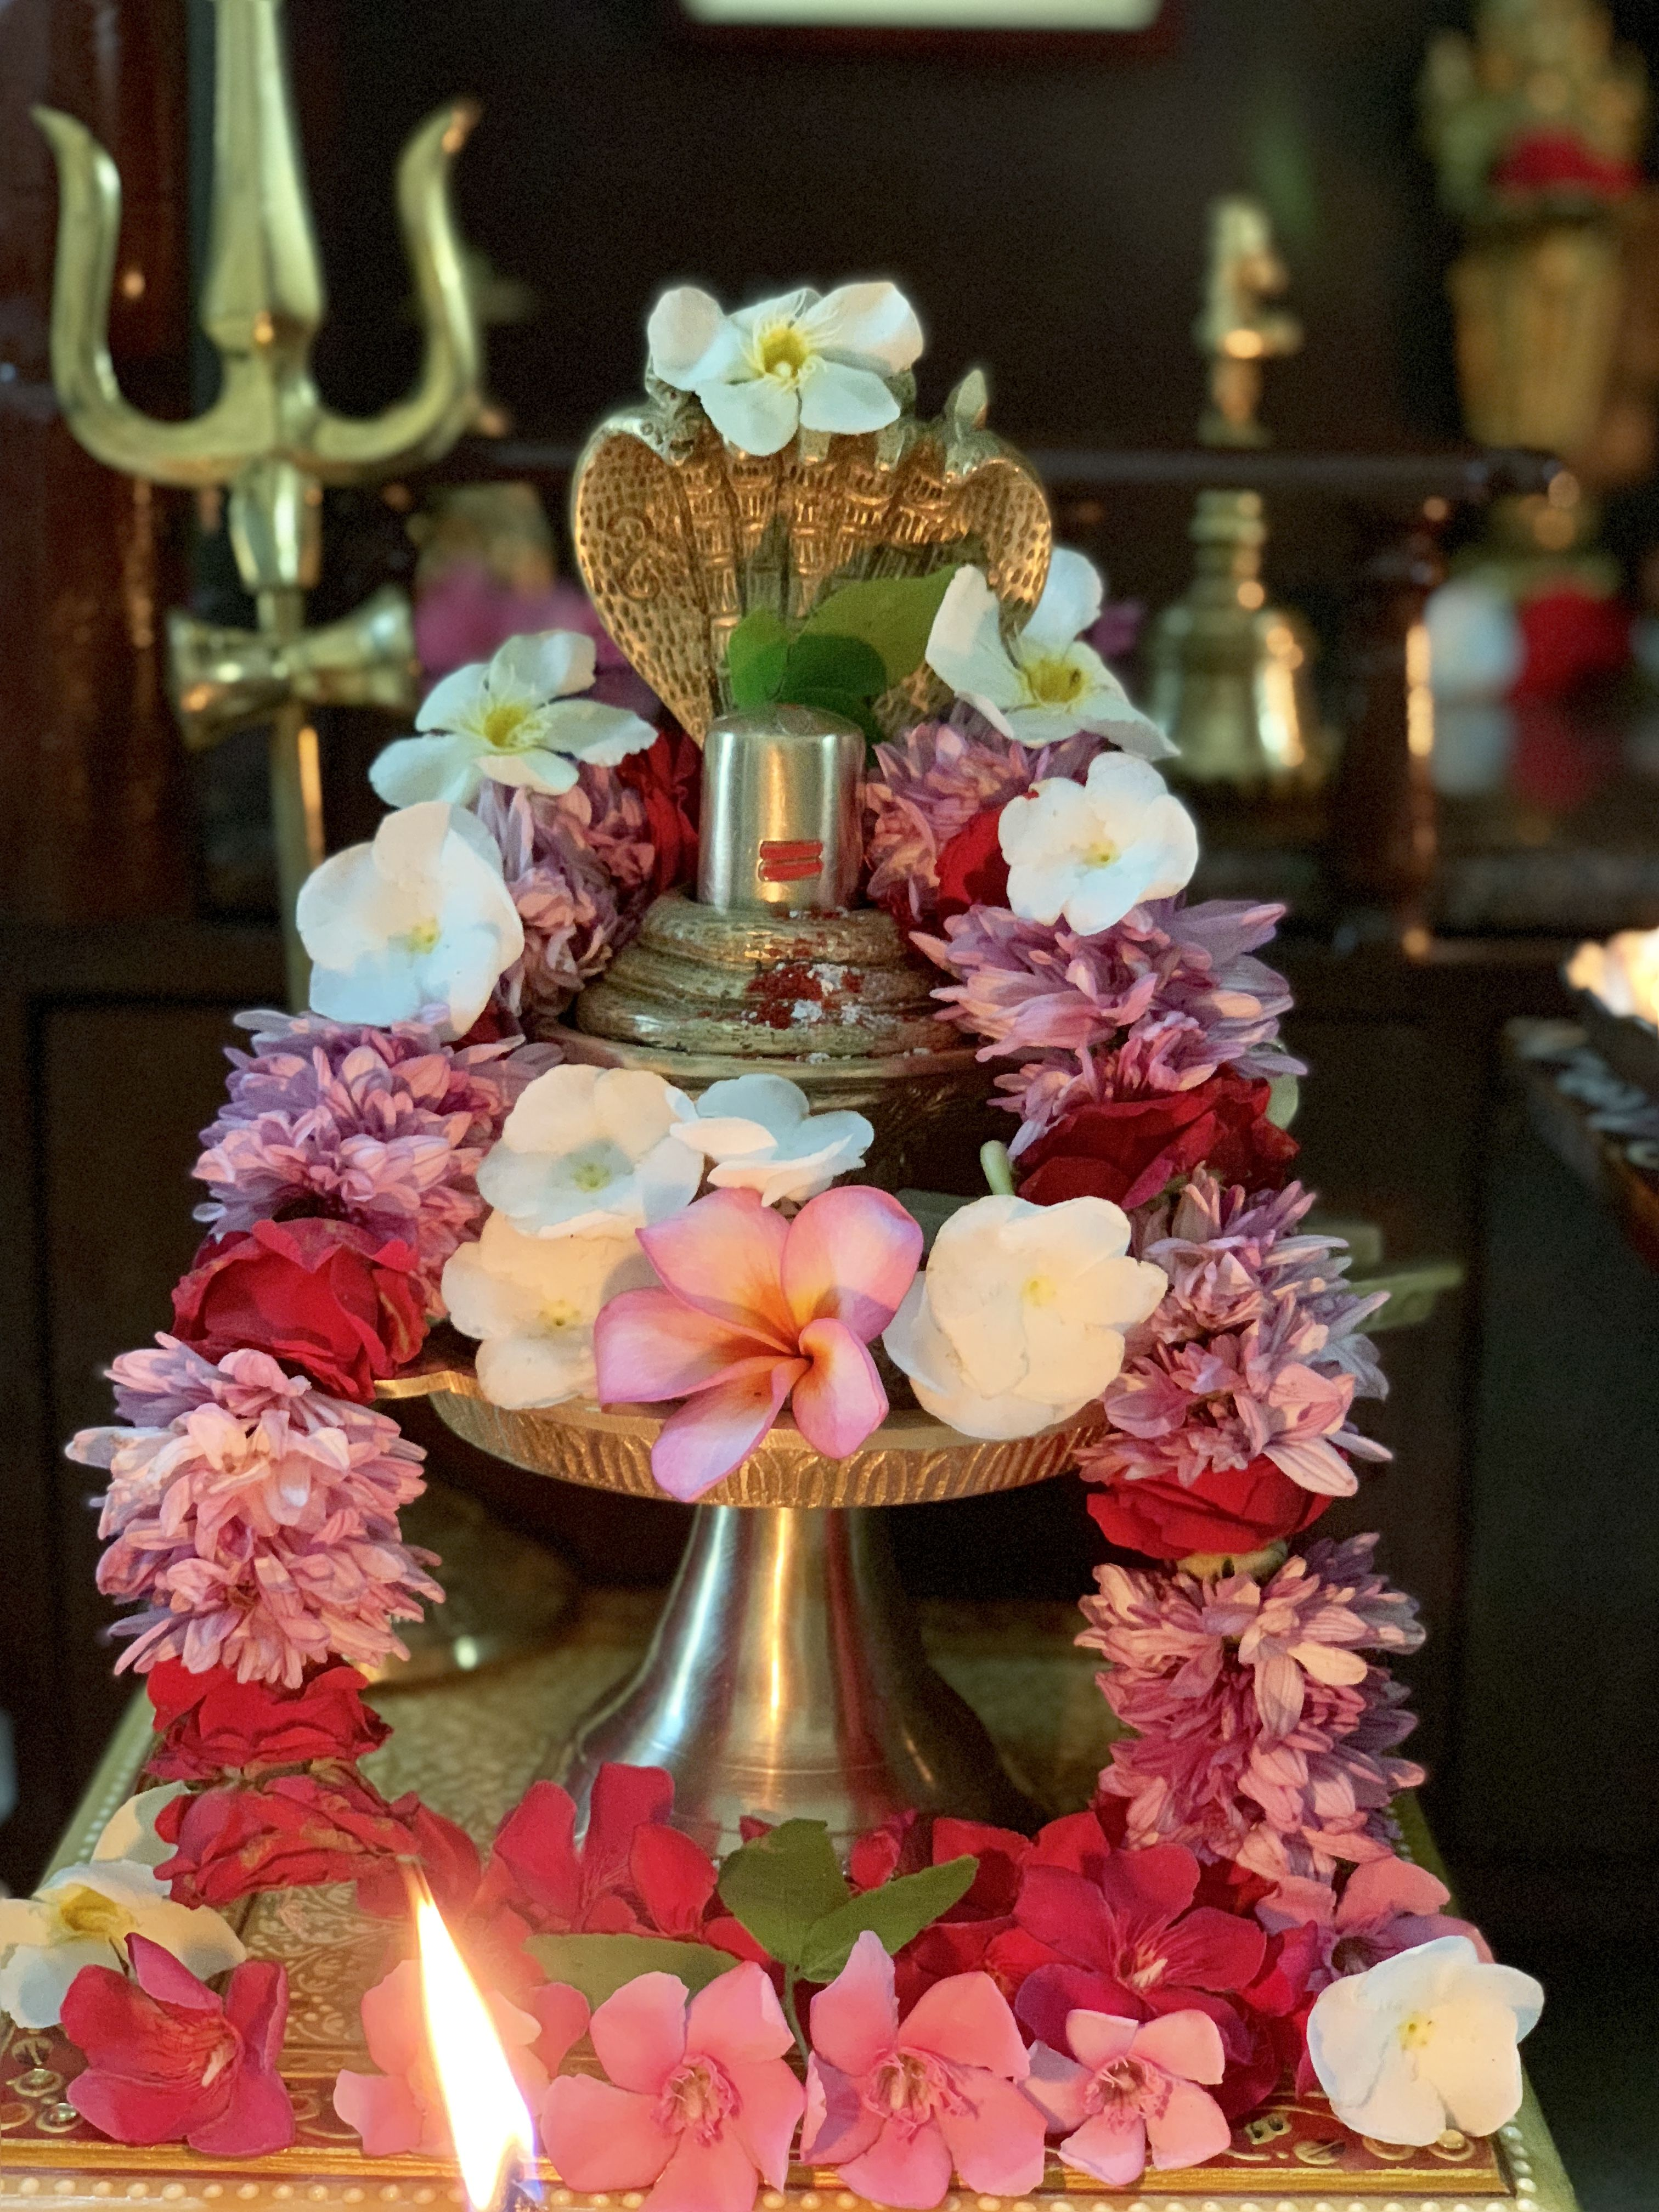 Pin by Penumatsa Neelu on Puja decorations in 2019 | Lord